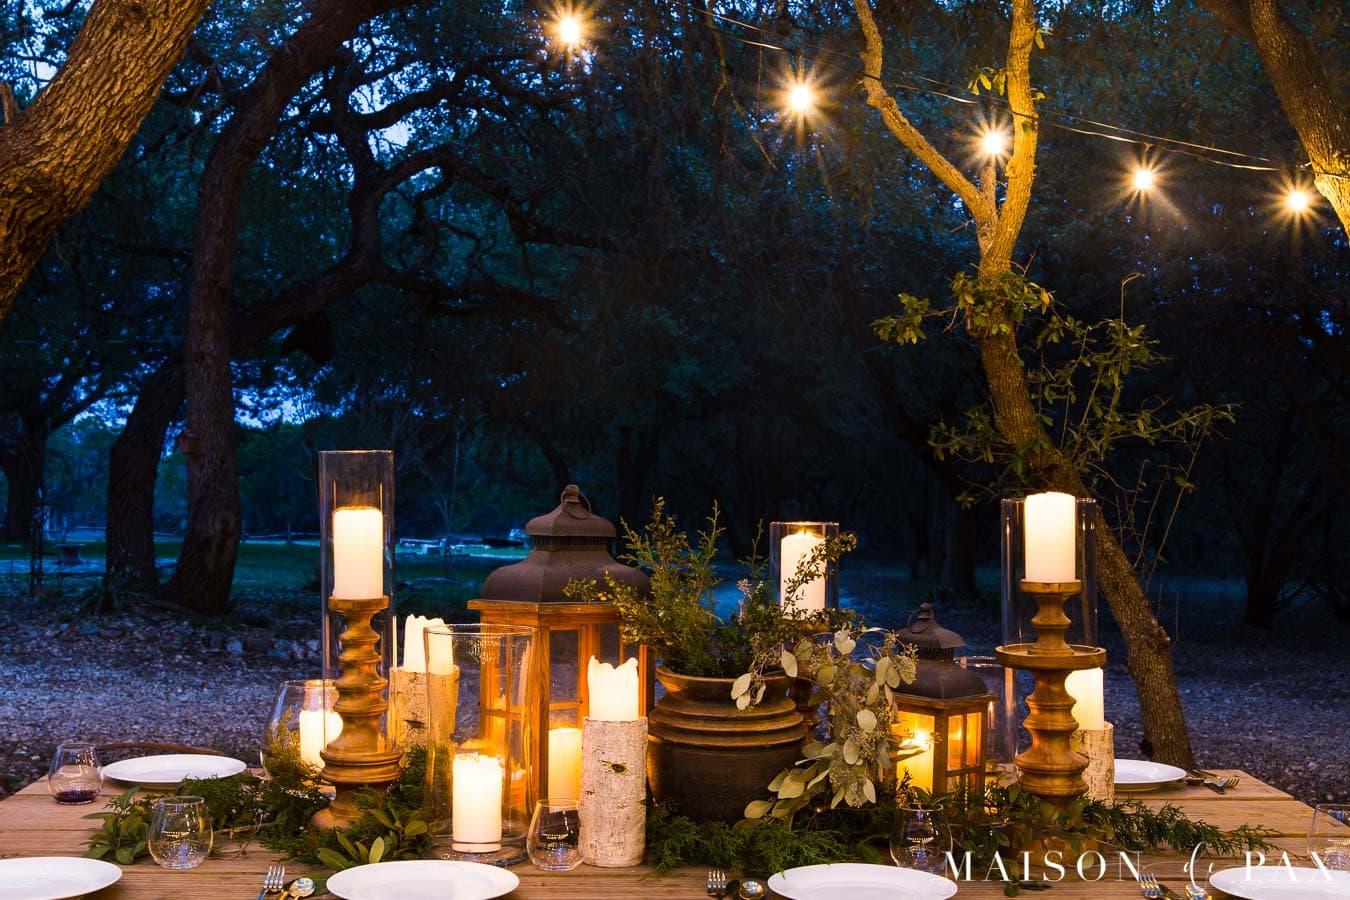 elegant al fresco dining by candlelight | Maison de Pax